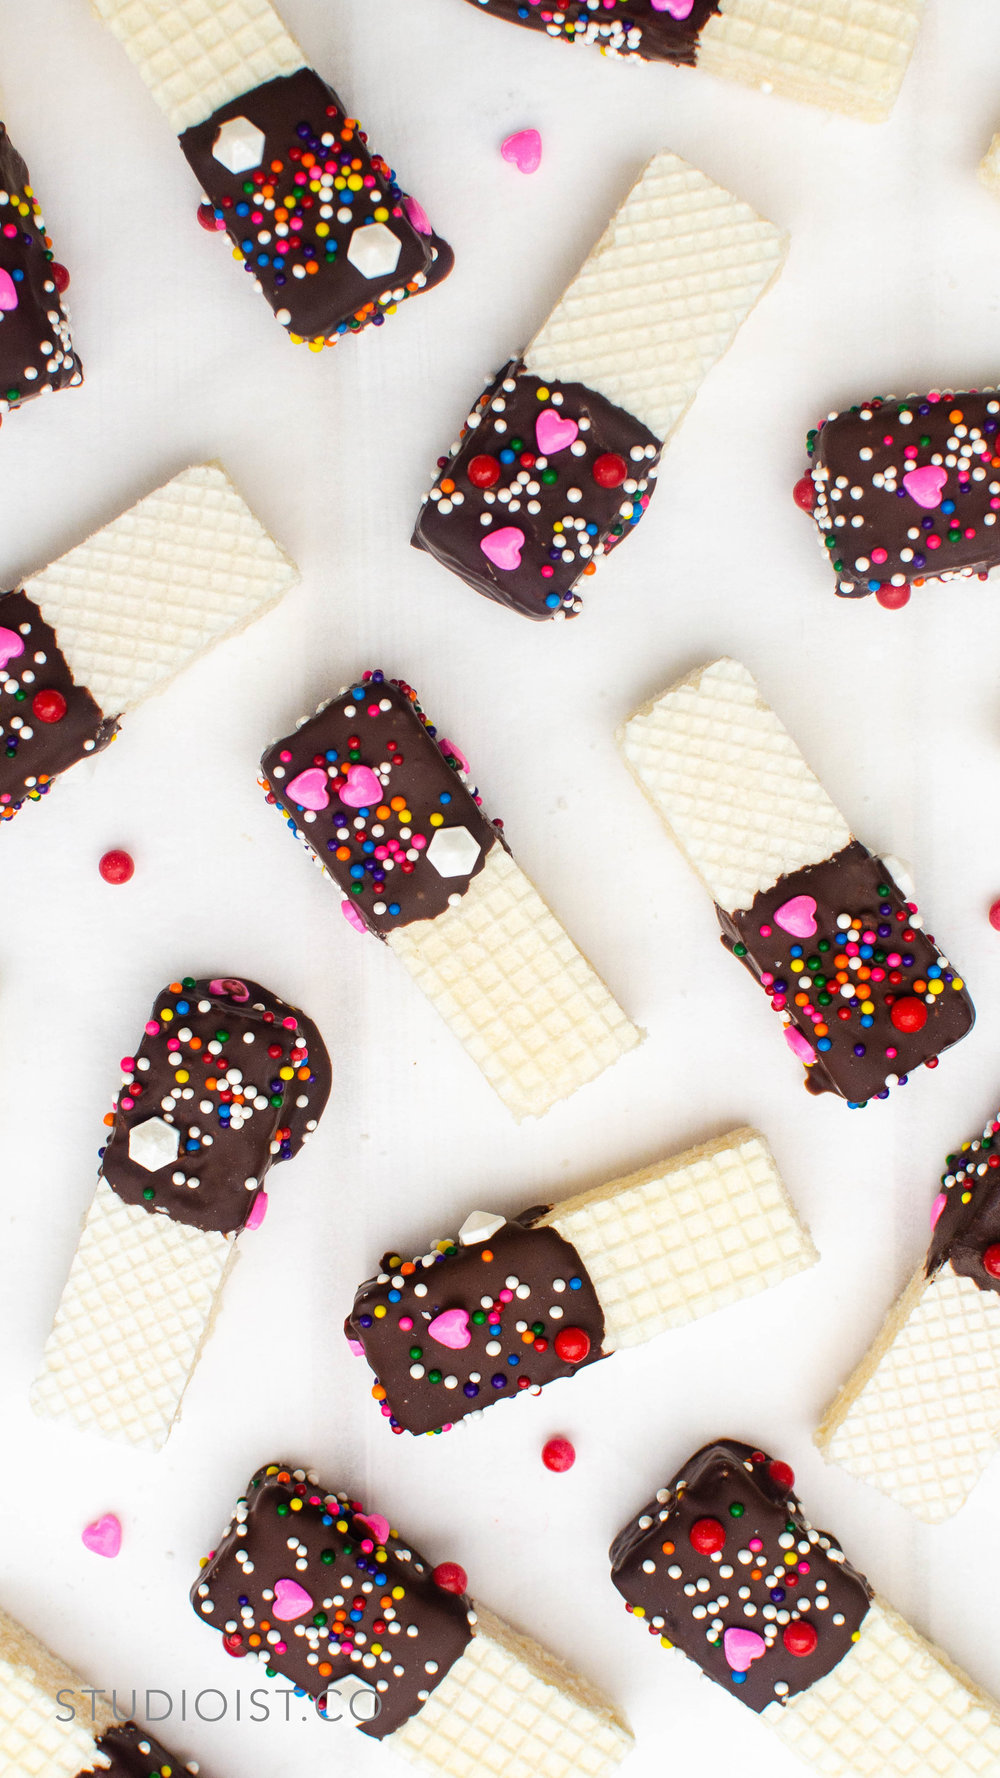 ChocolateDipped Sugar Wafers - Studioist3.jpg